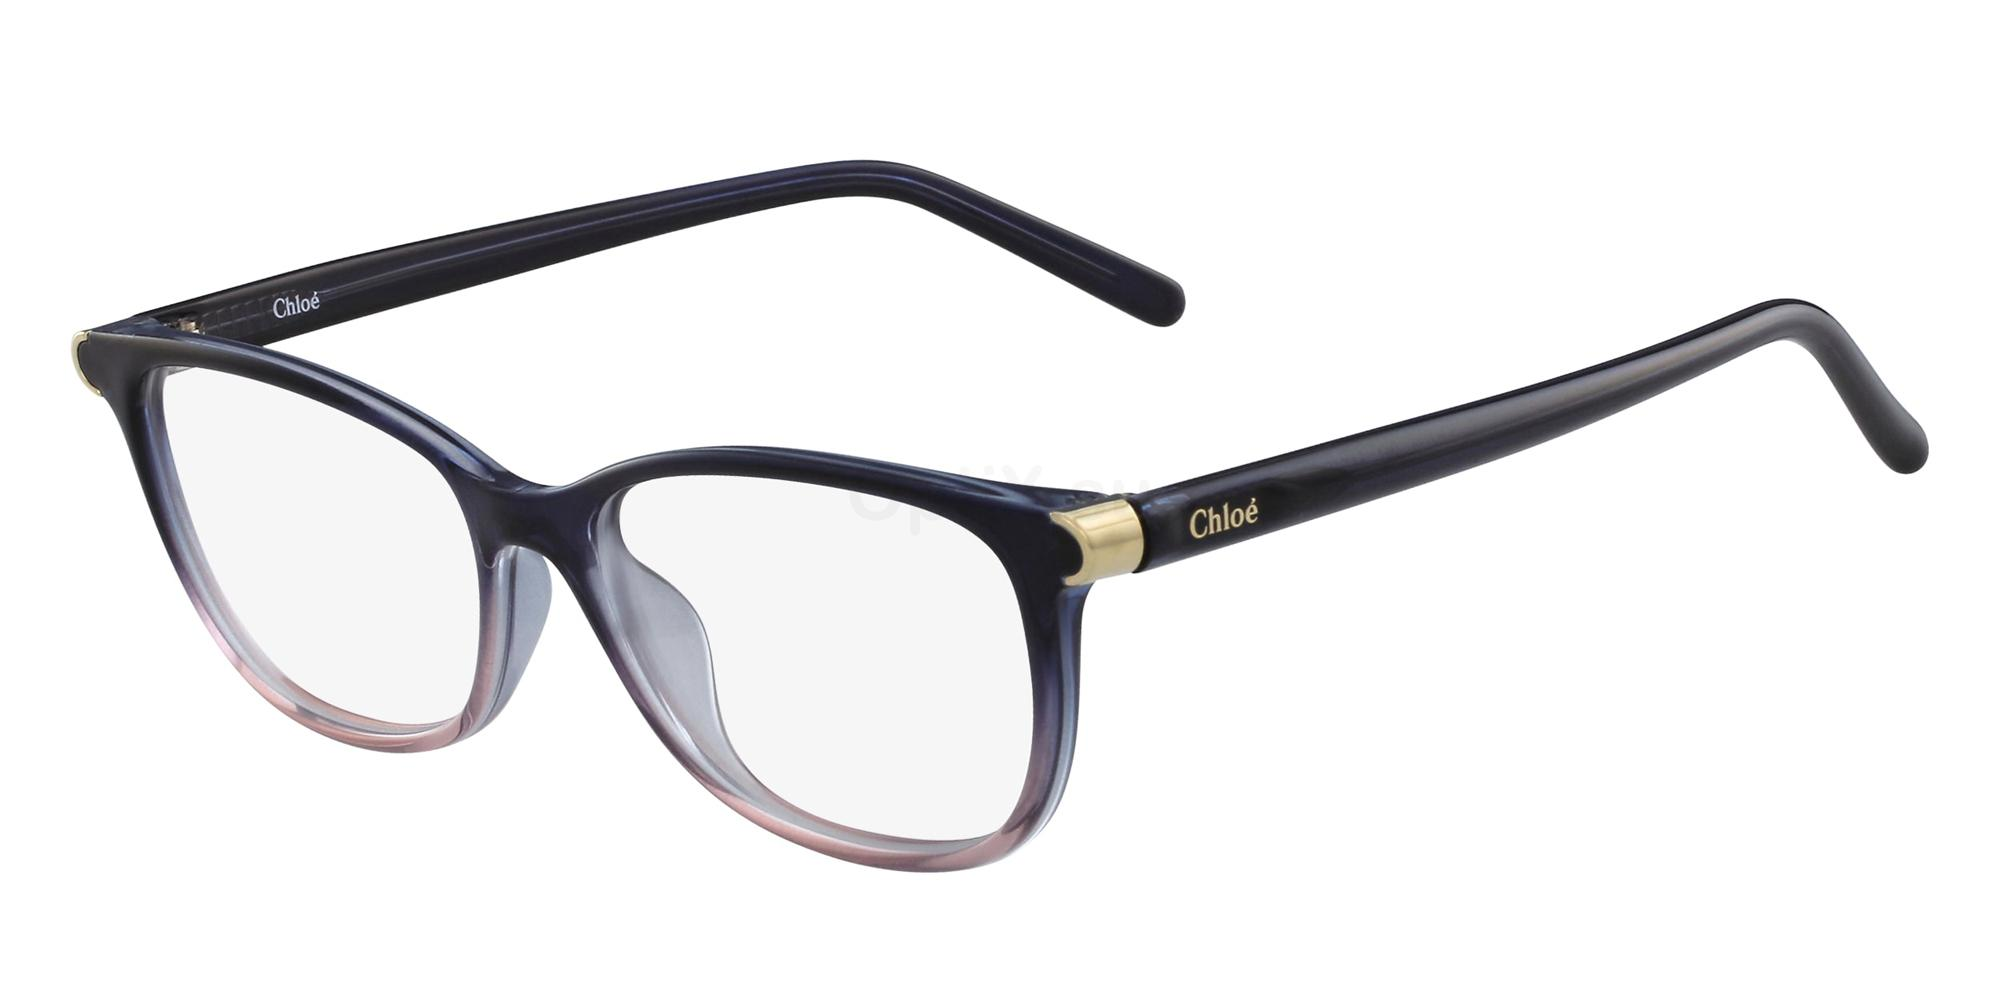 047 CE2716 Glasses, Chloe